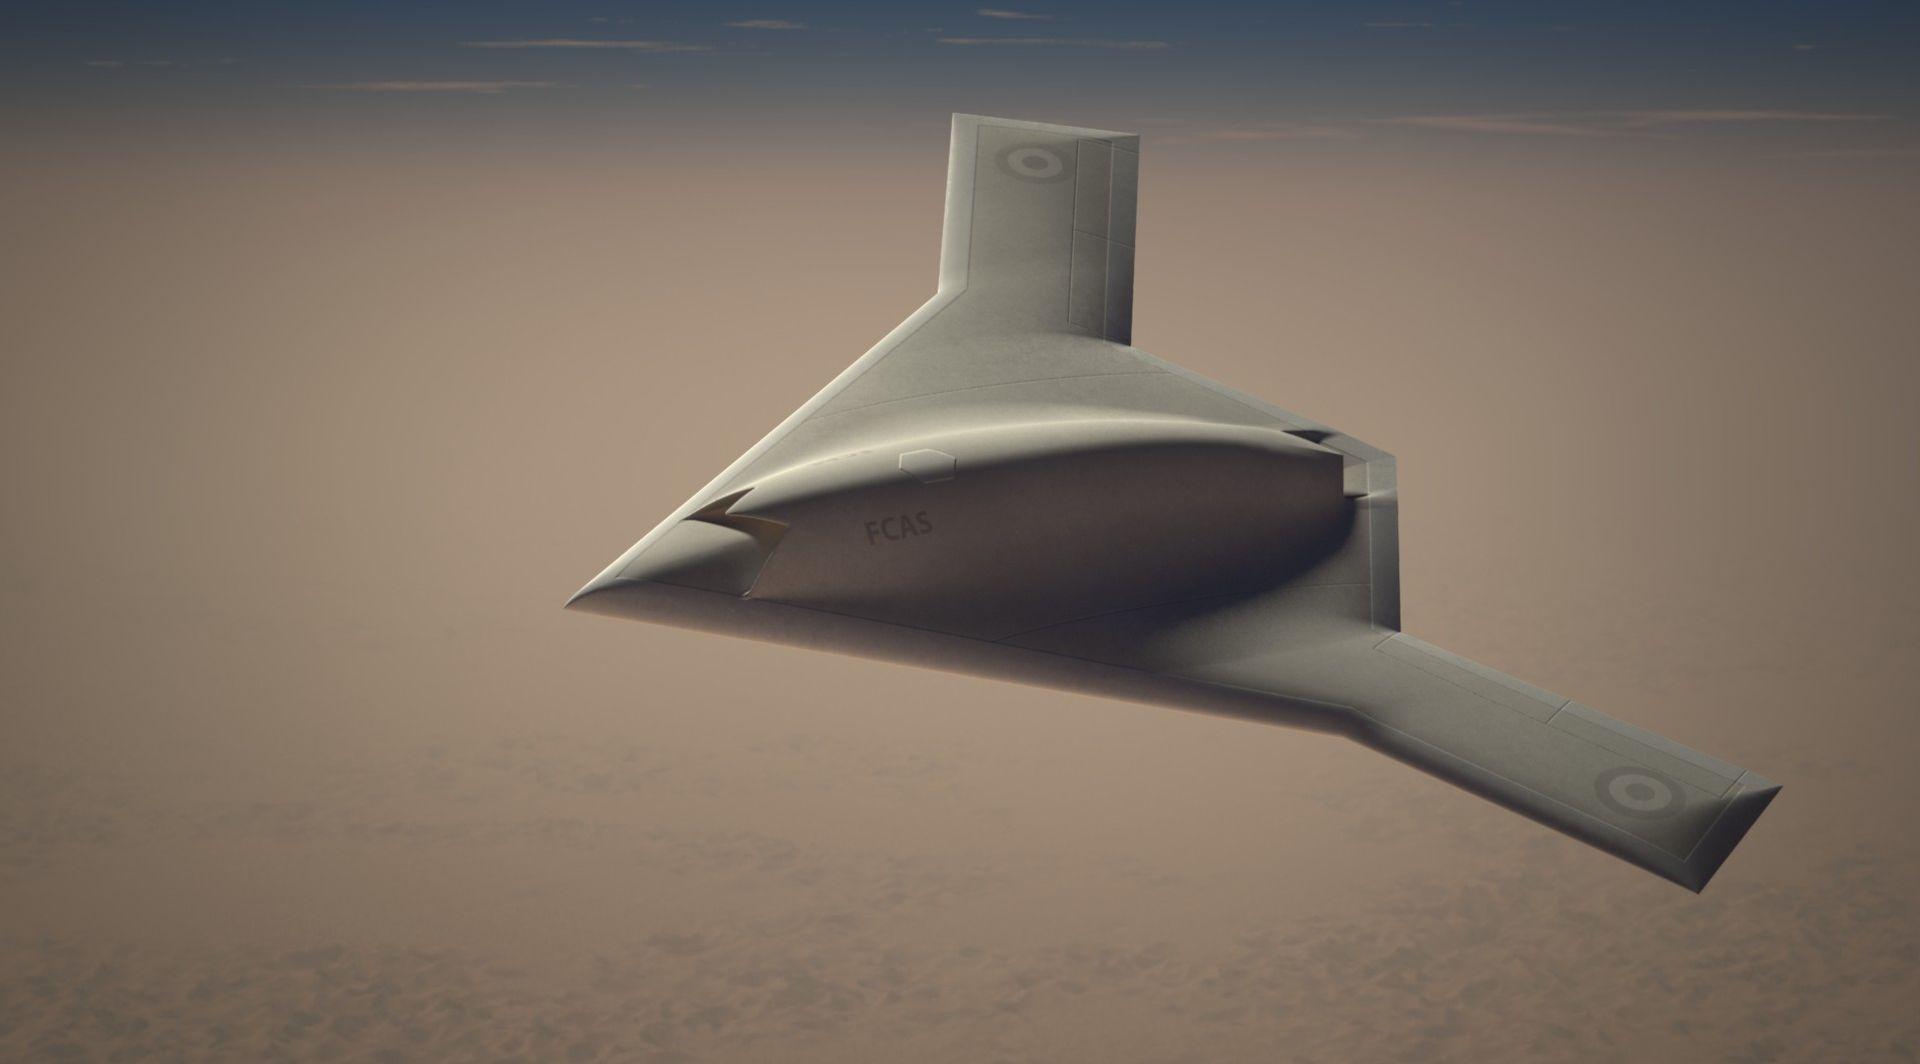 Le drone franco britannique prend forme for Chambre de commerce franco britannique londres